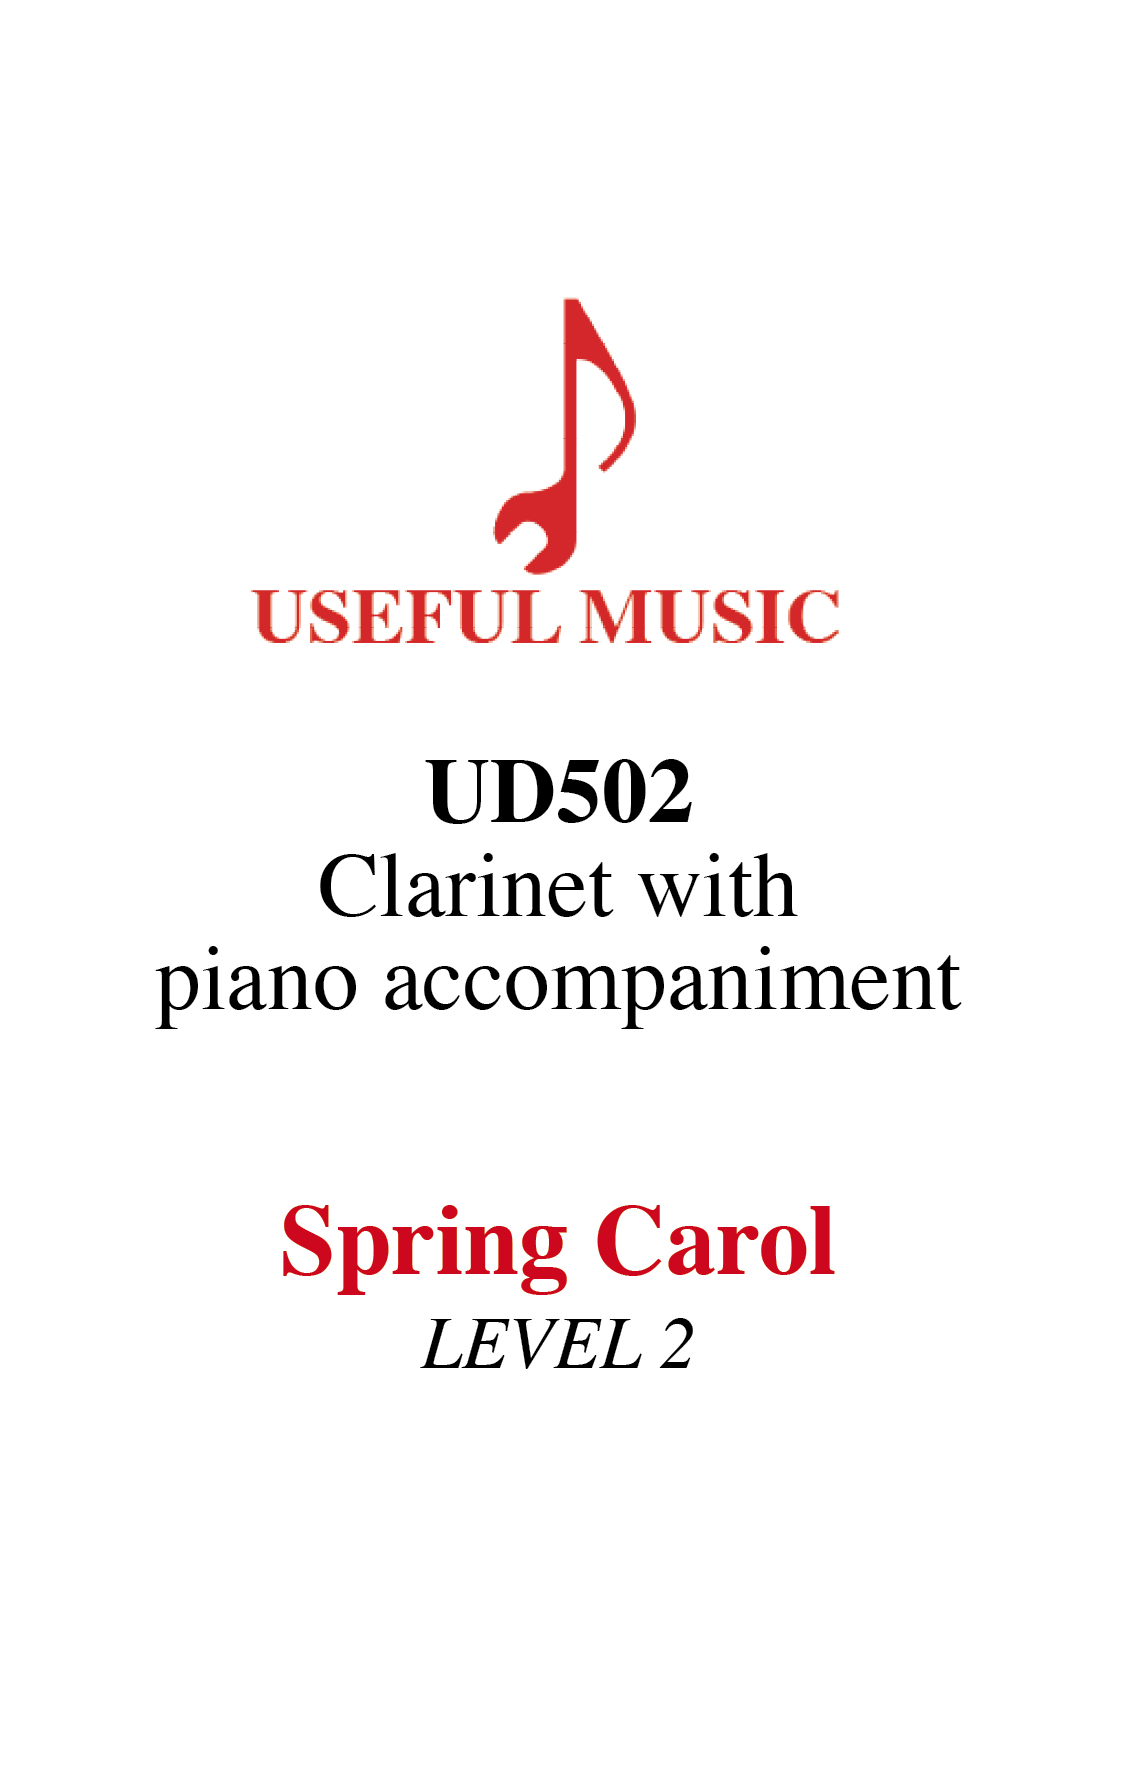 Spring Carol - Clarinet with piano accompaniment